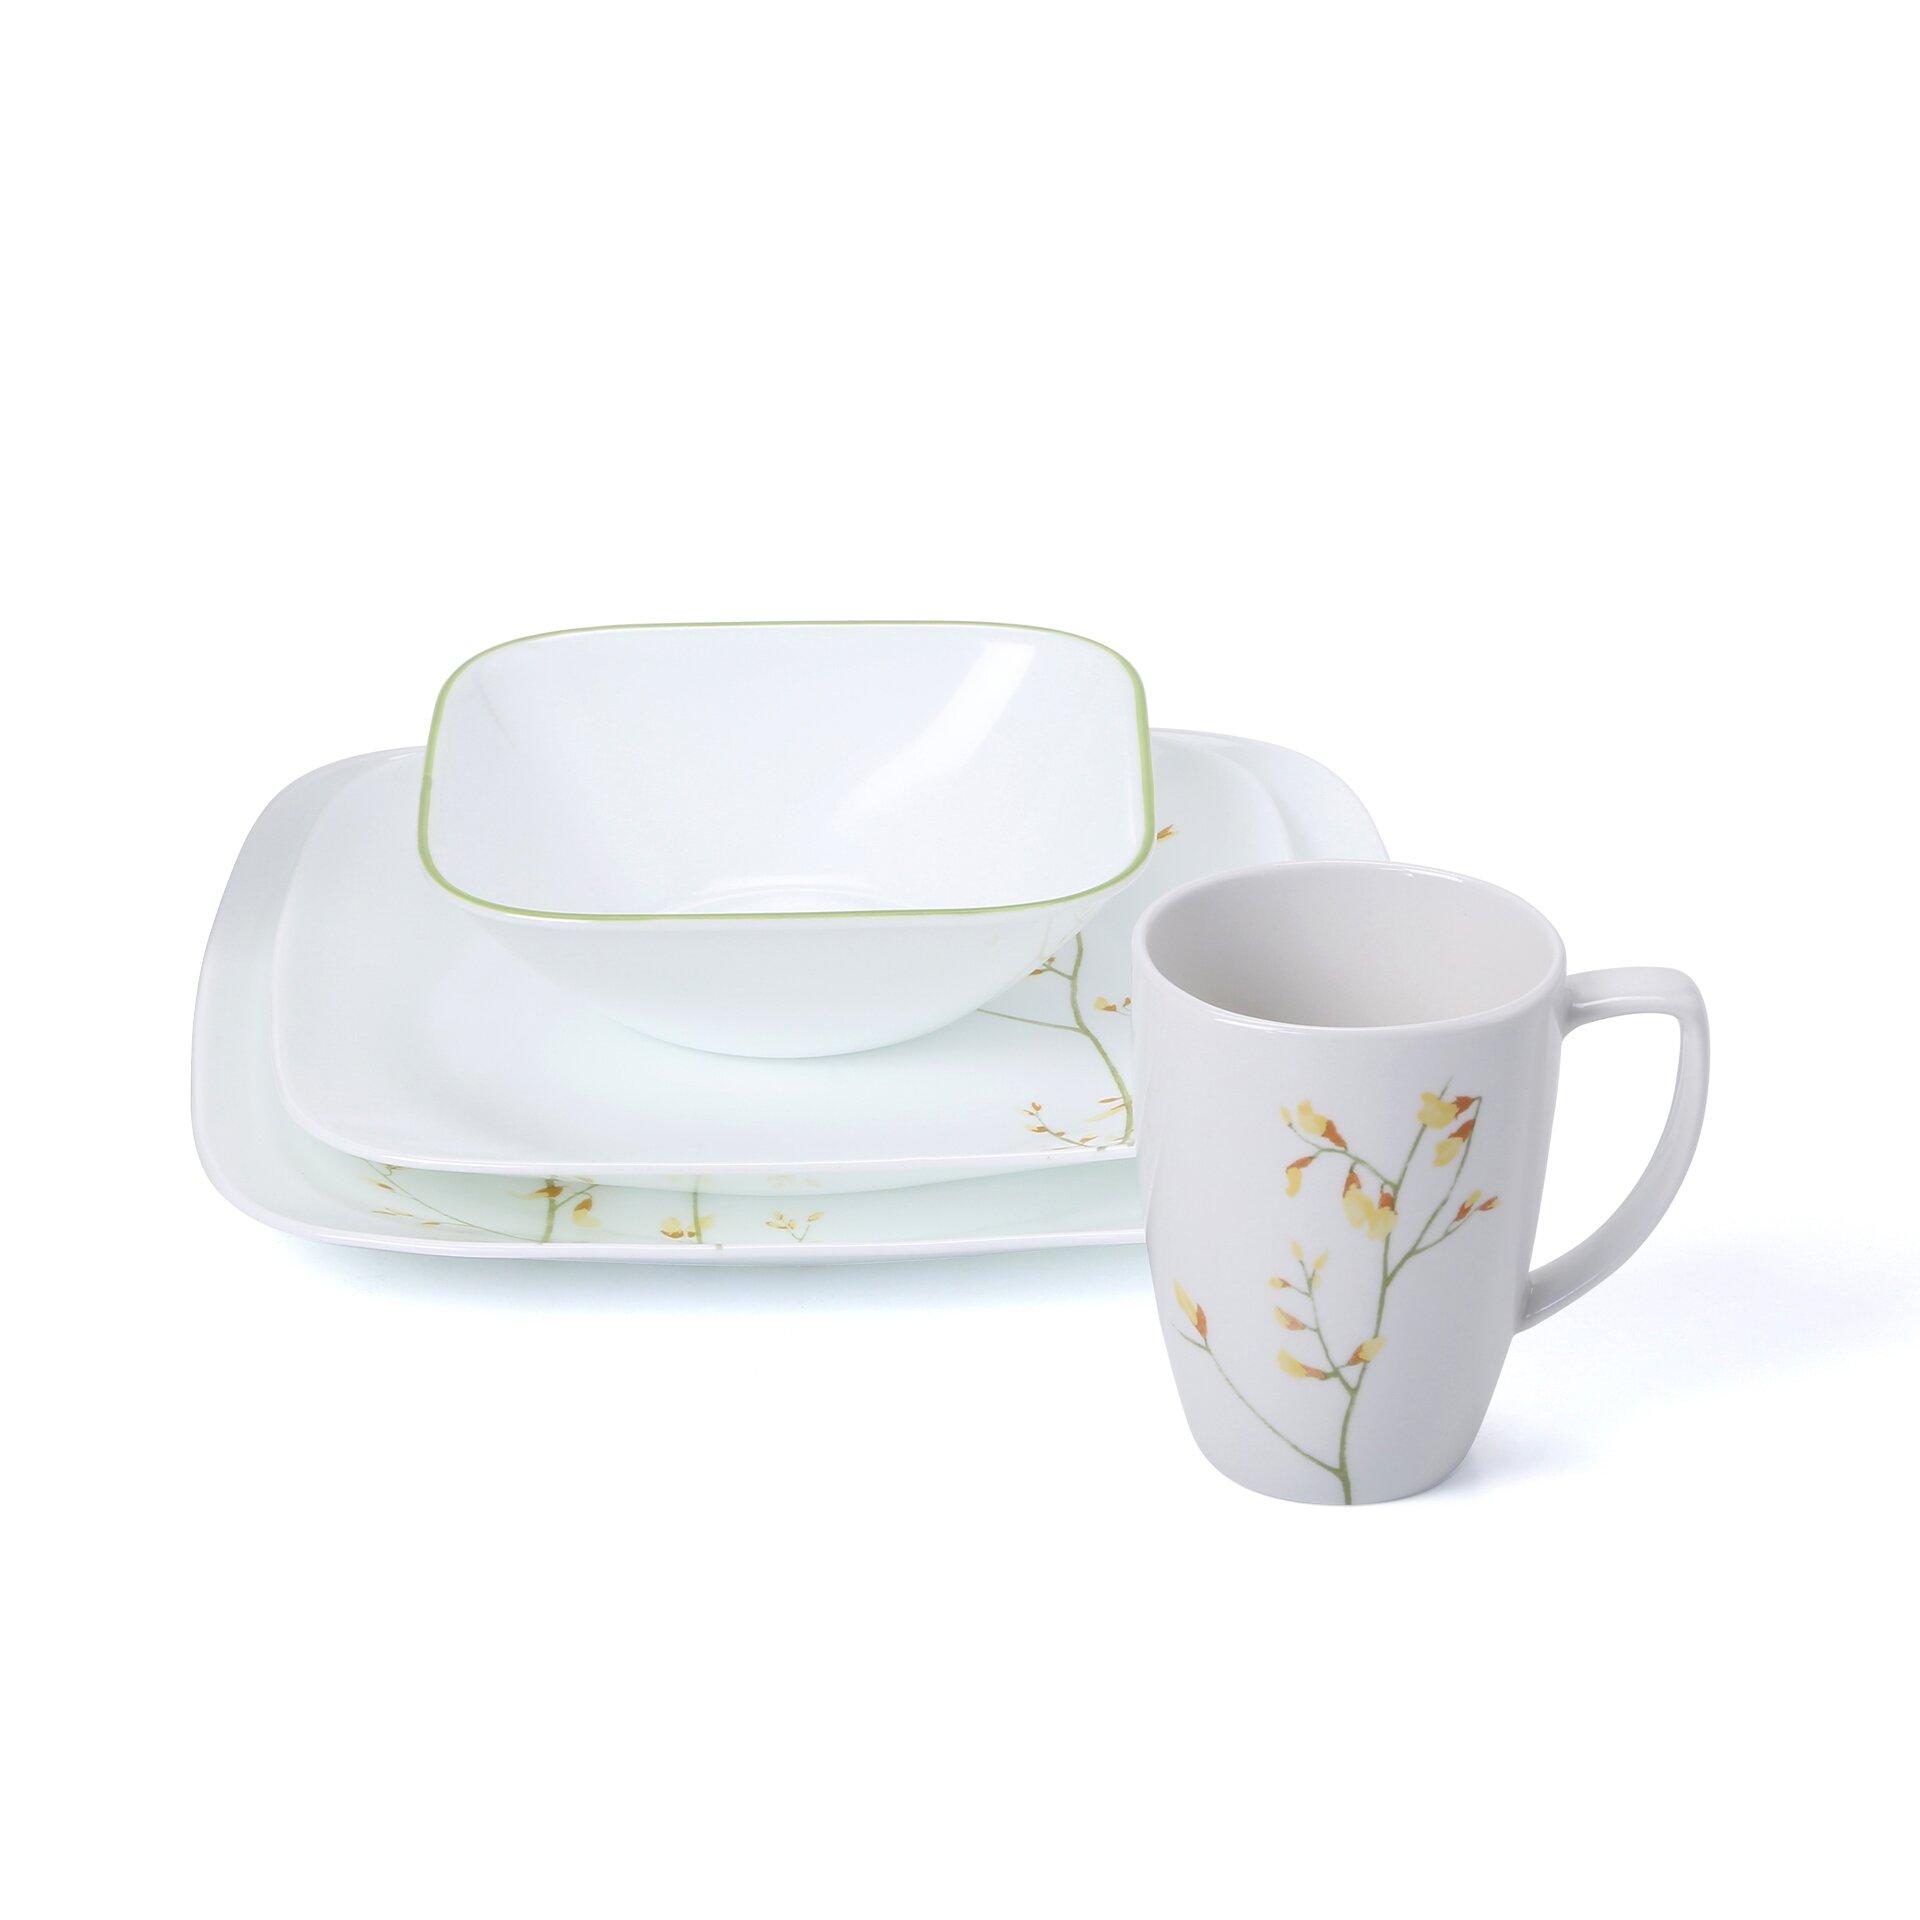 corelle kobe 16 piece dinnerware set reviews wayfair. Black Bedroom Furniture Sets. Home Design Ideas